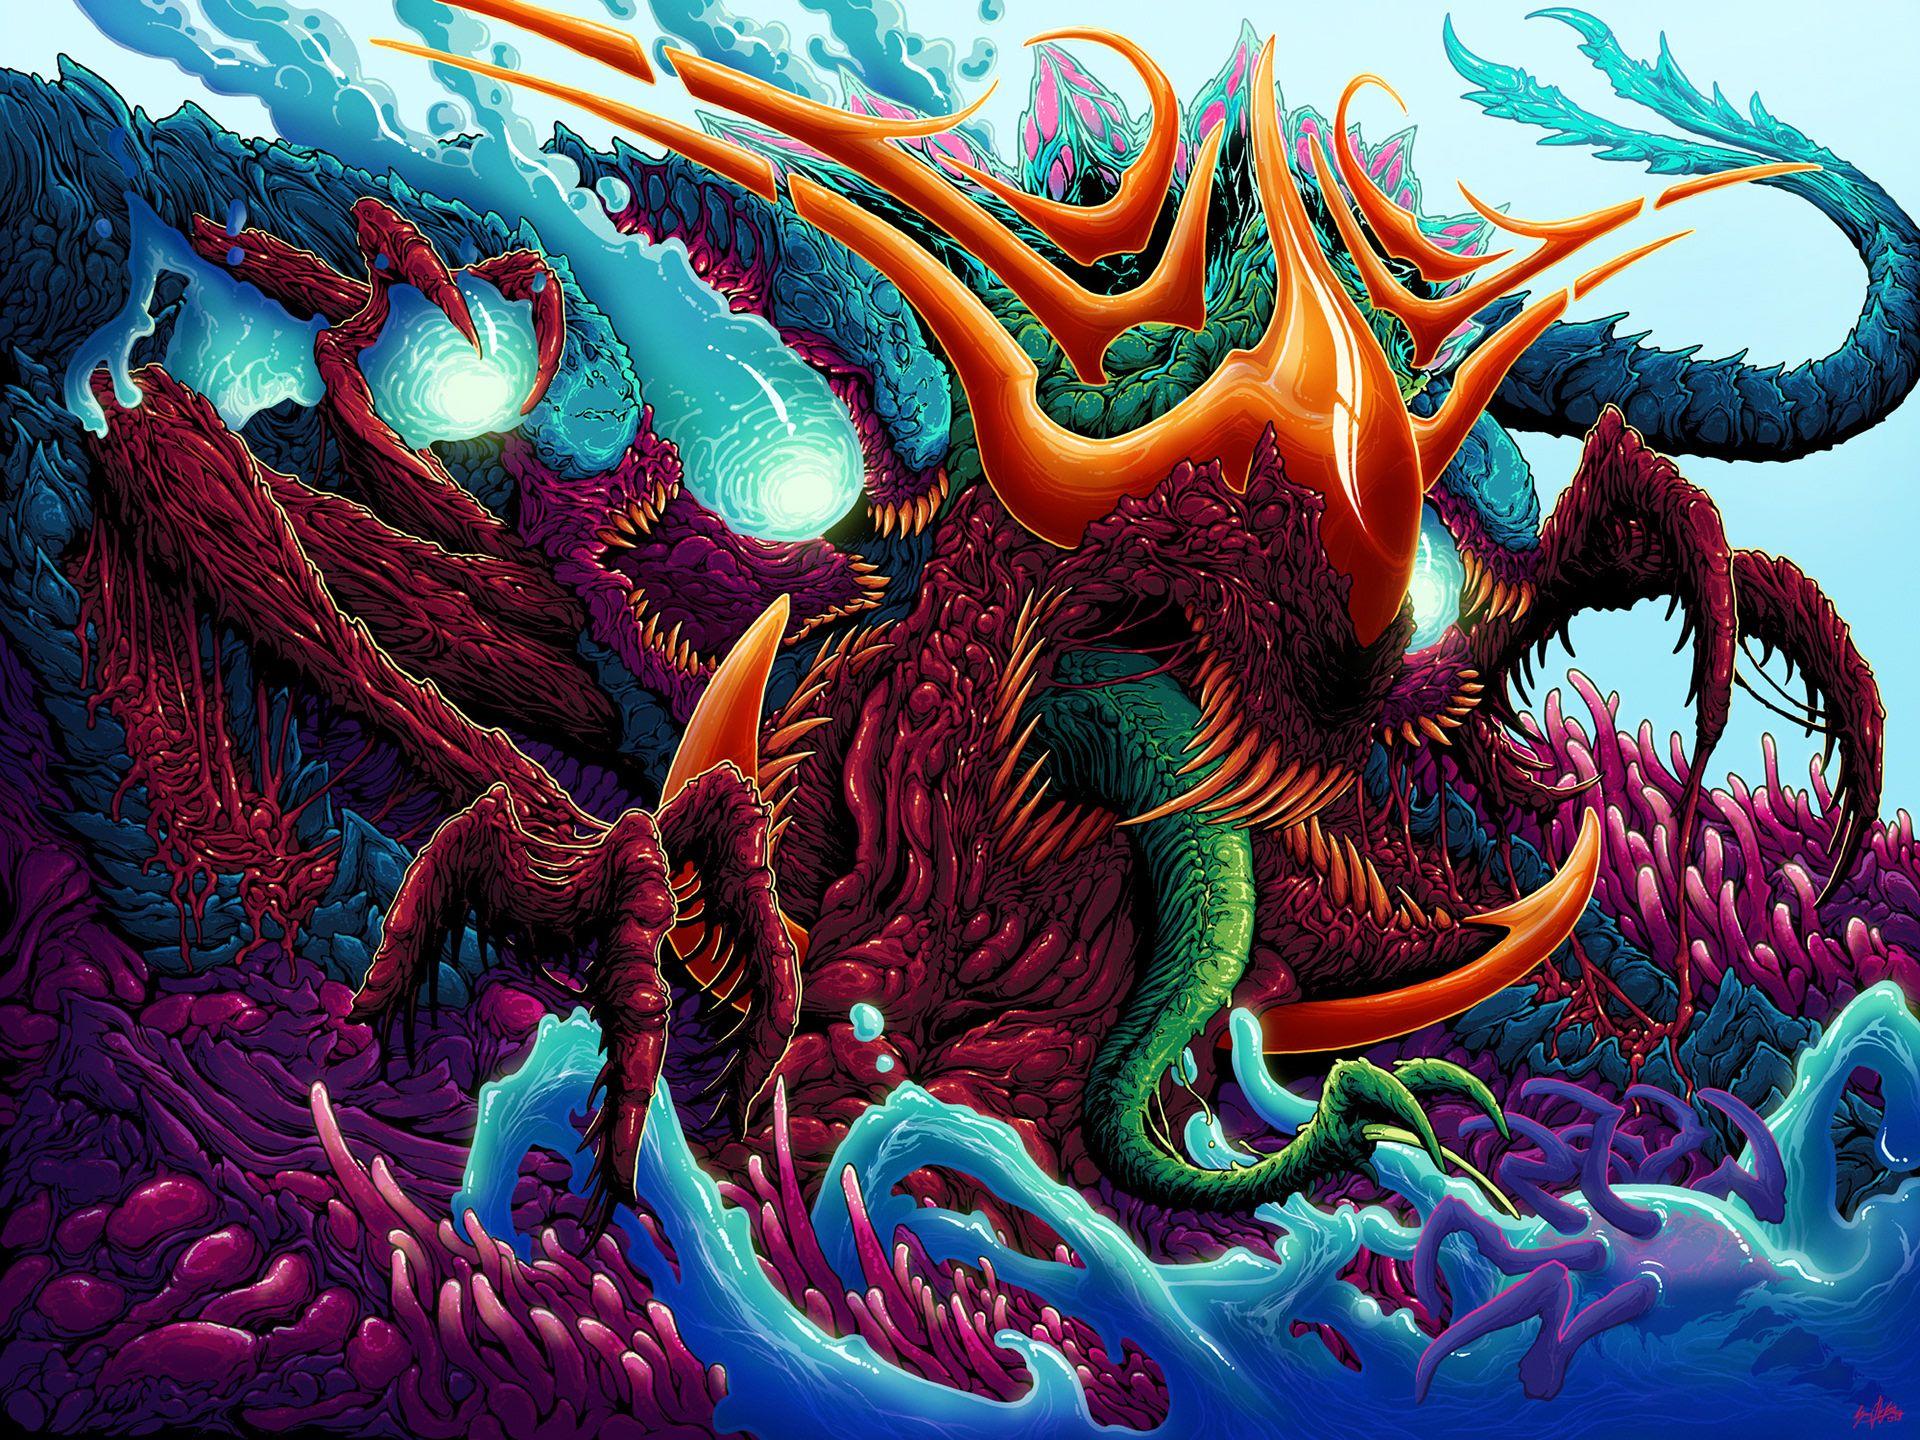 Brock Hofer - Hyper Beast | Hyper beast wallpaper, Hyper ...